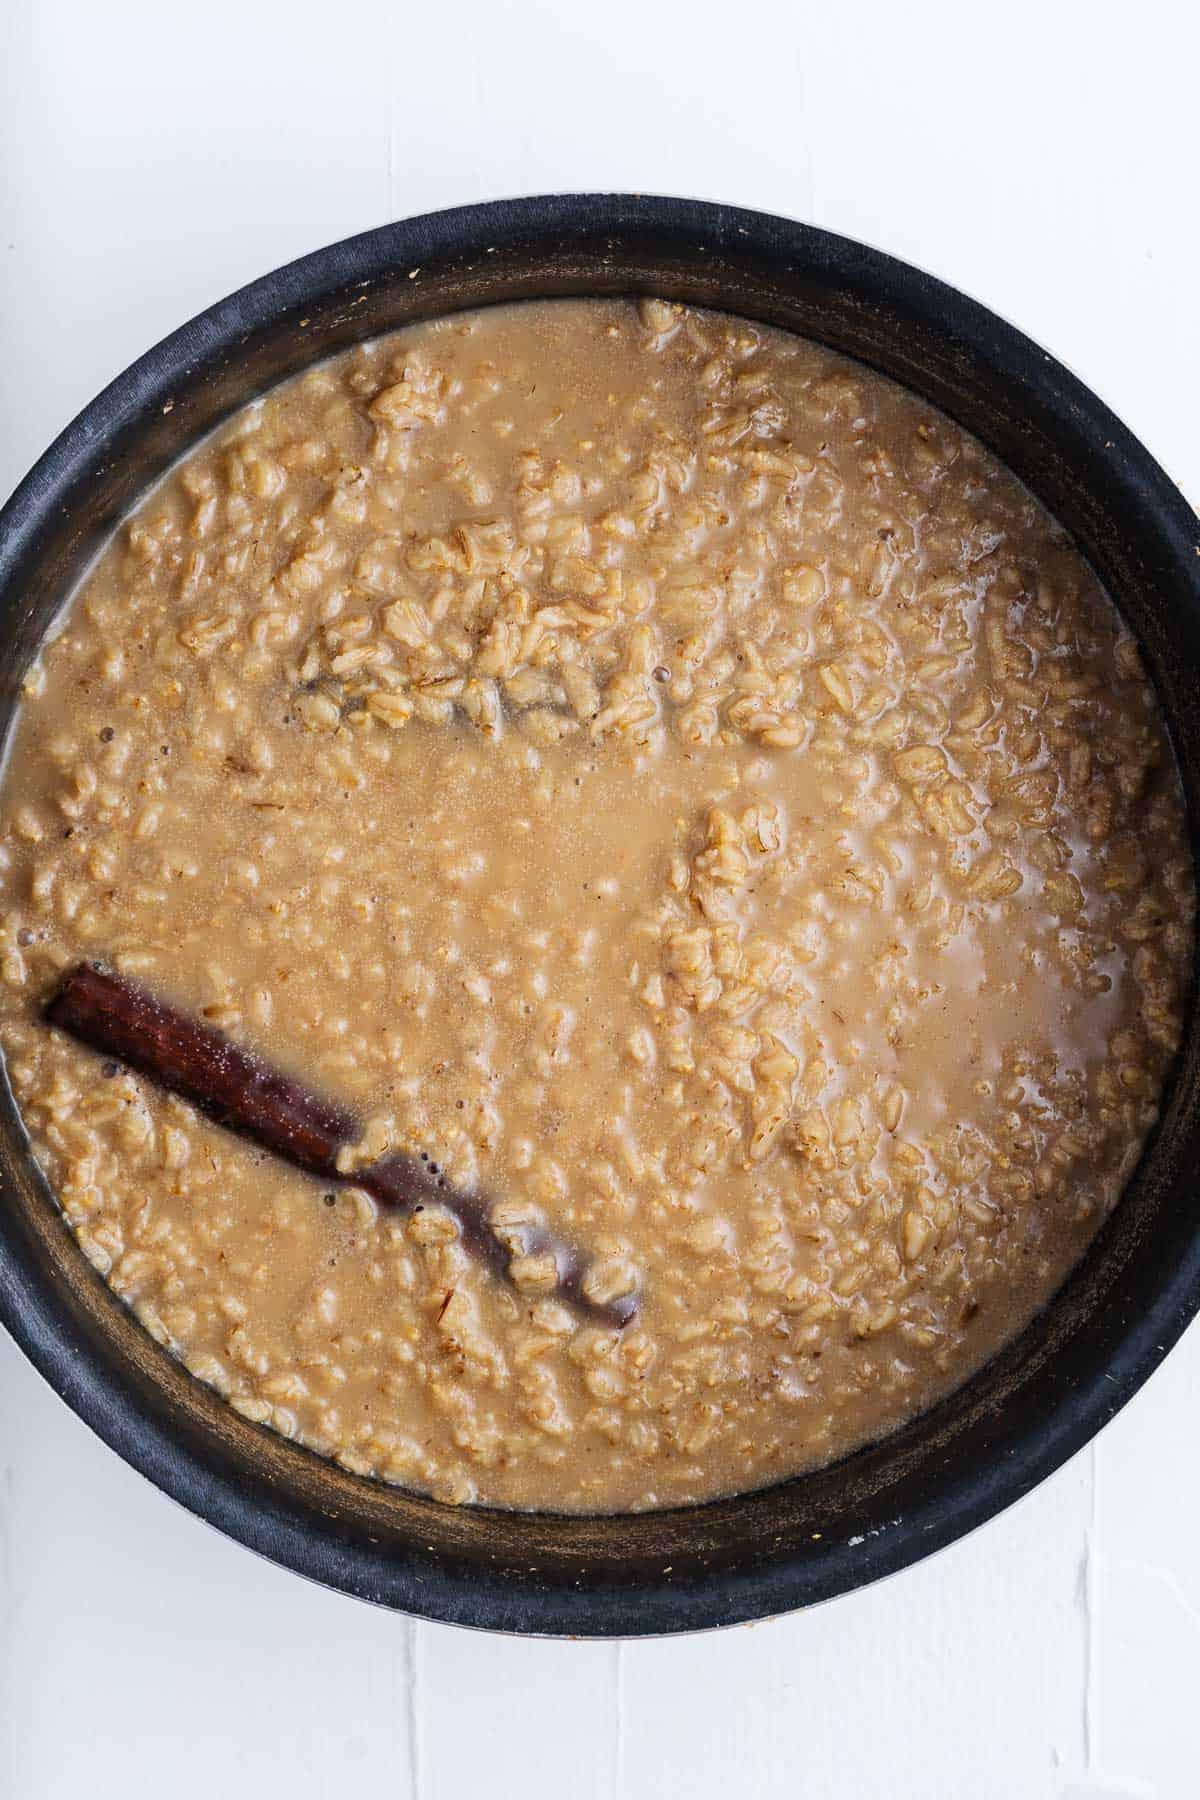 Oatmeal in a Pot